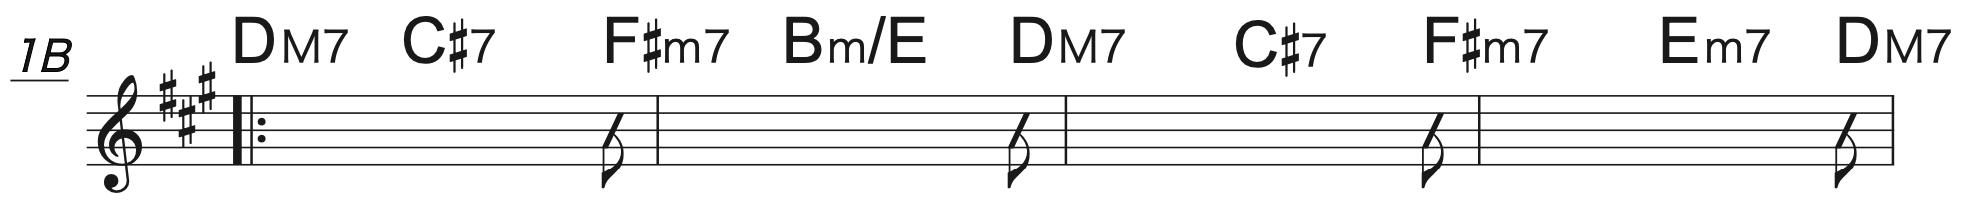 Pretender Aコード楽譜(半音上げ)2